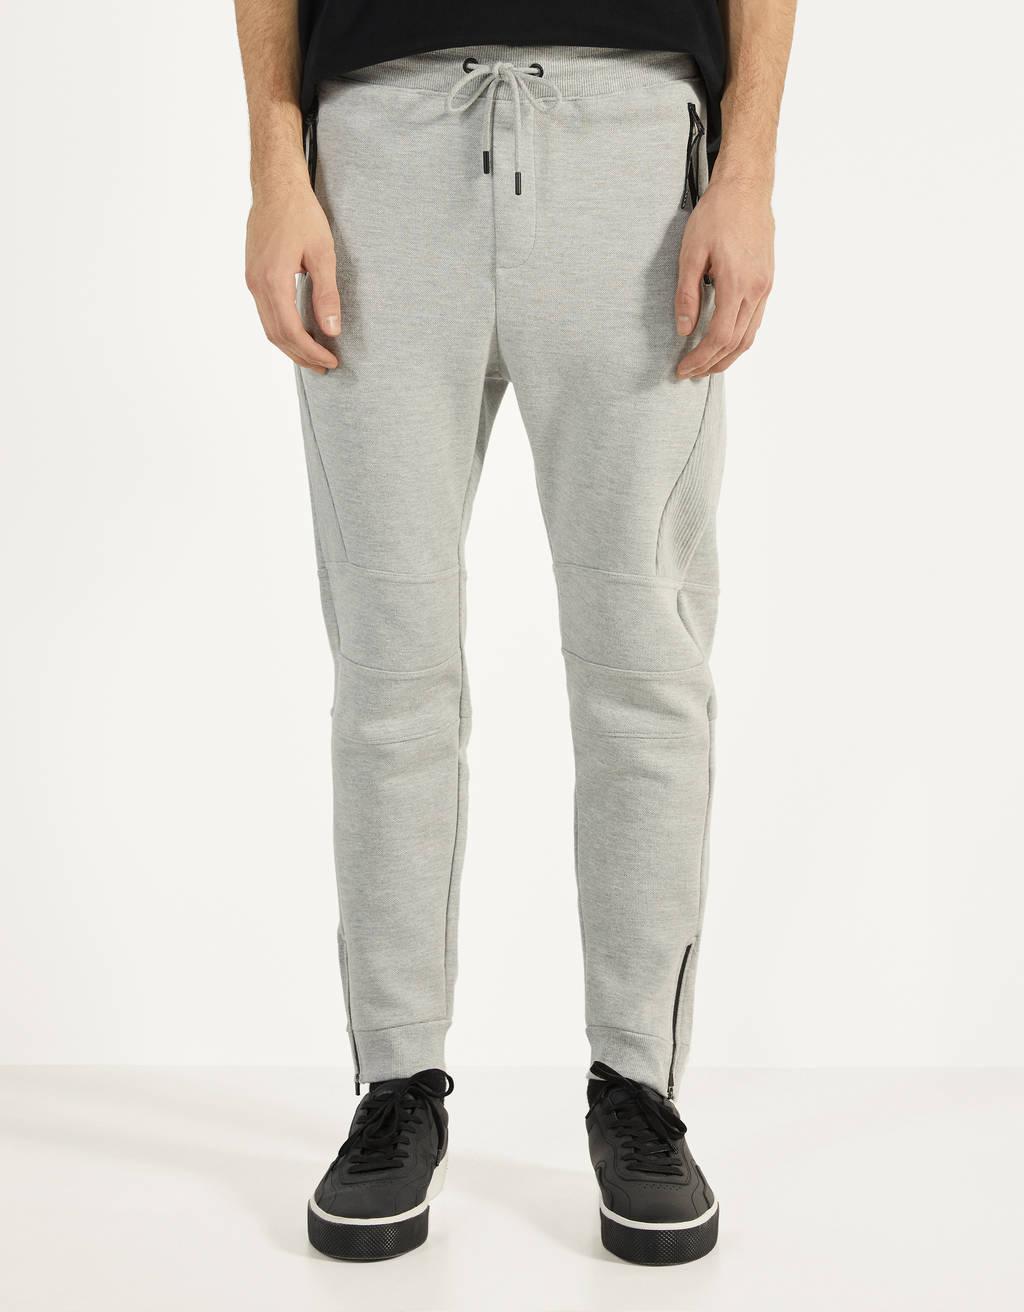 Pantalon jogger de type ottoman